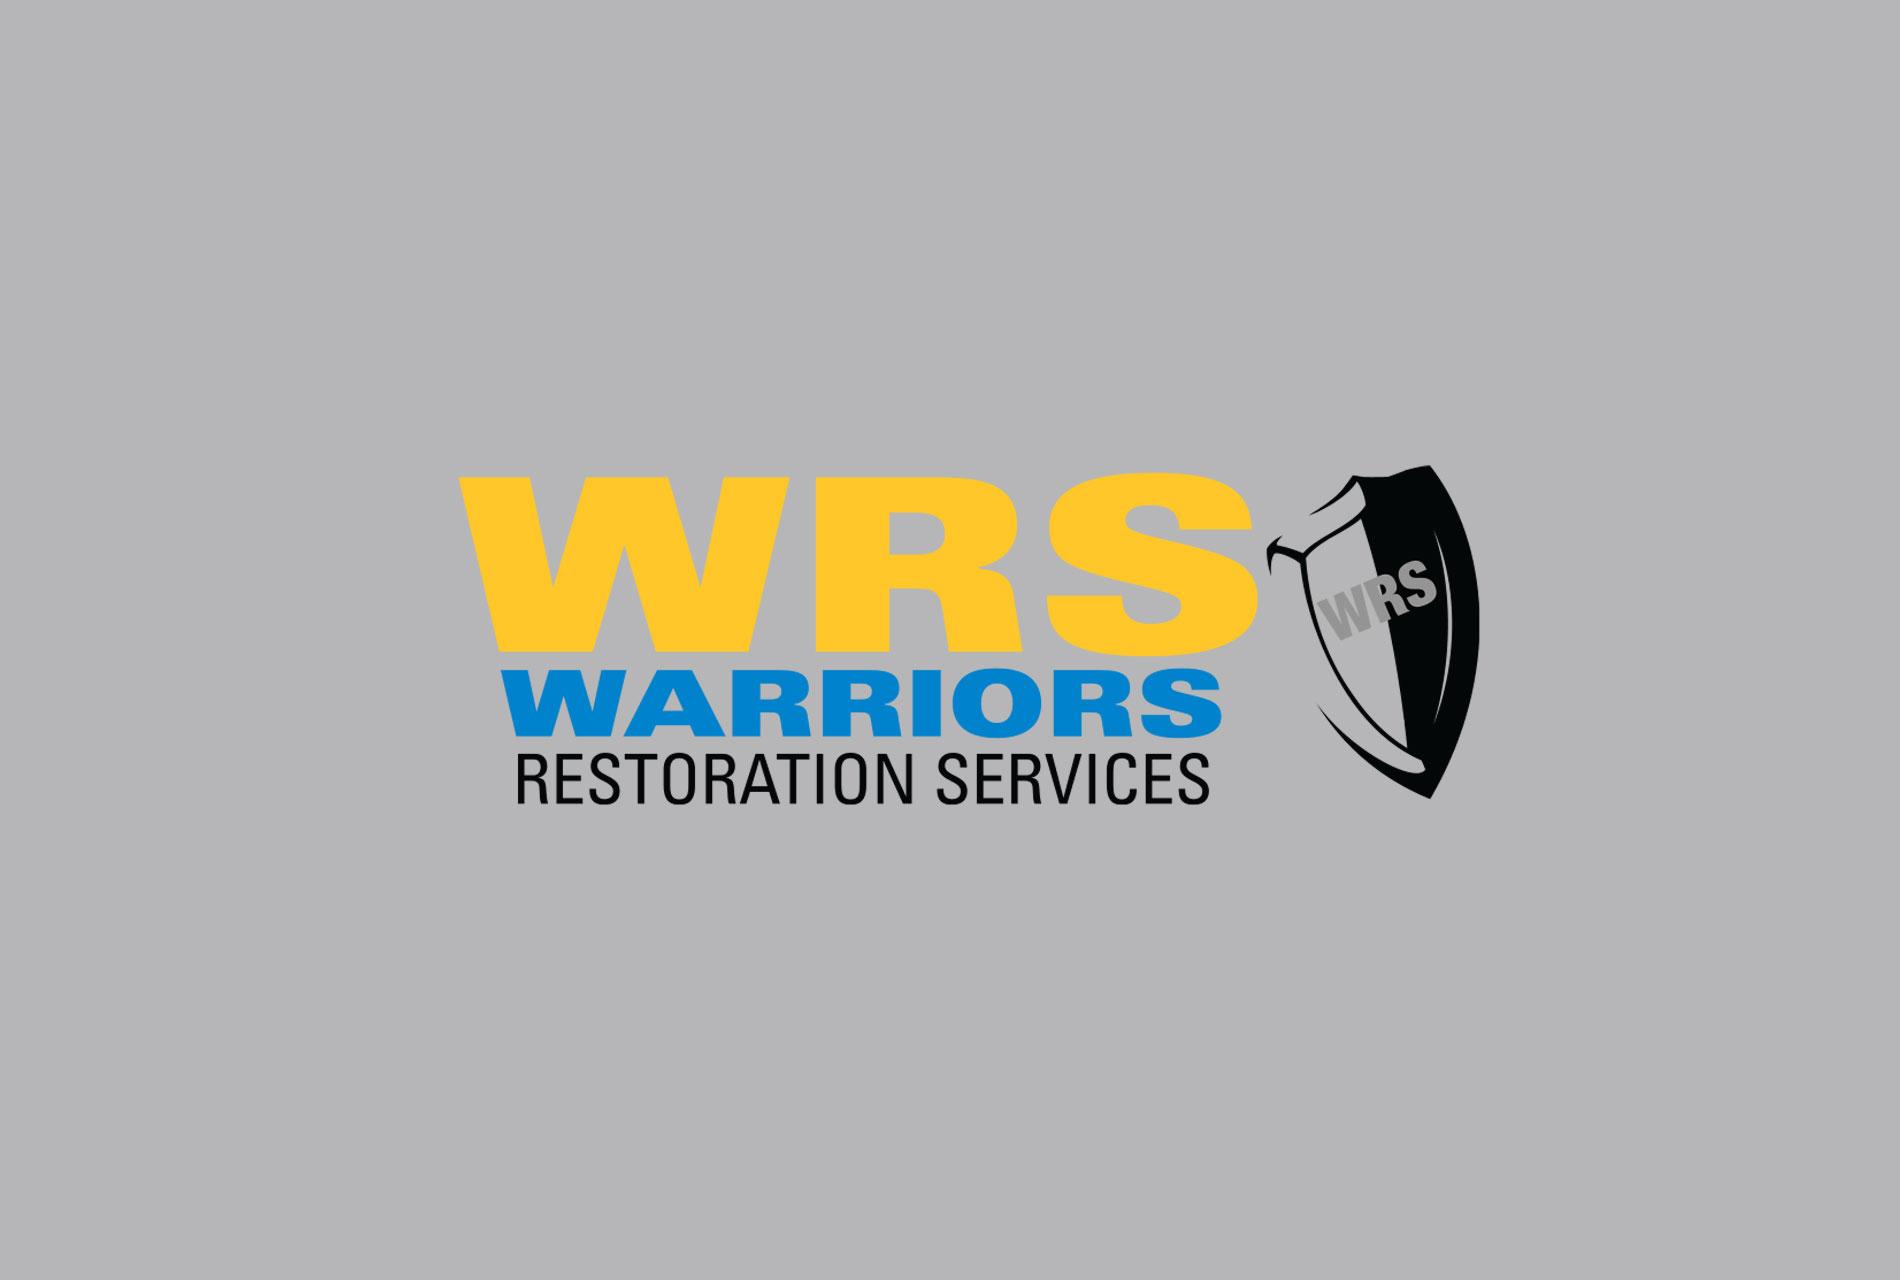 Warriors Restoration Services colored logo with emblem